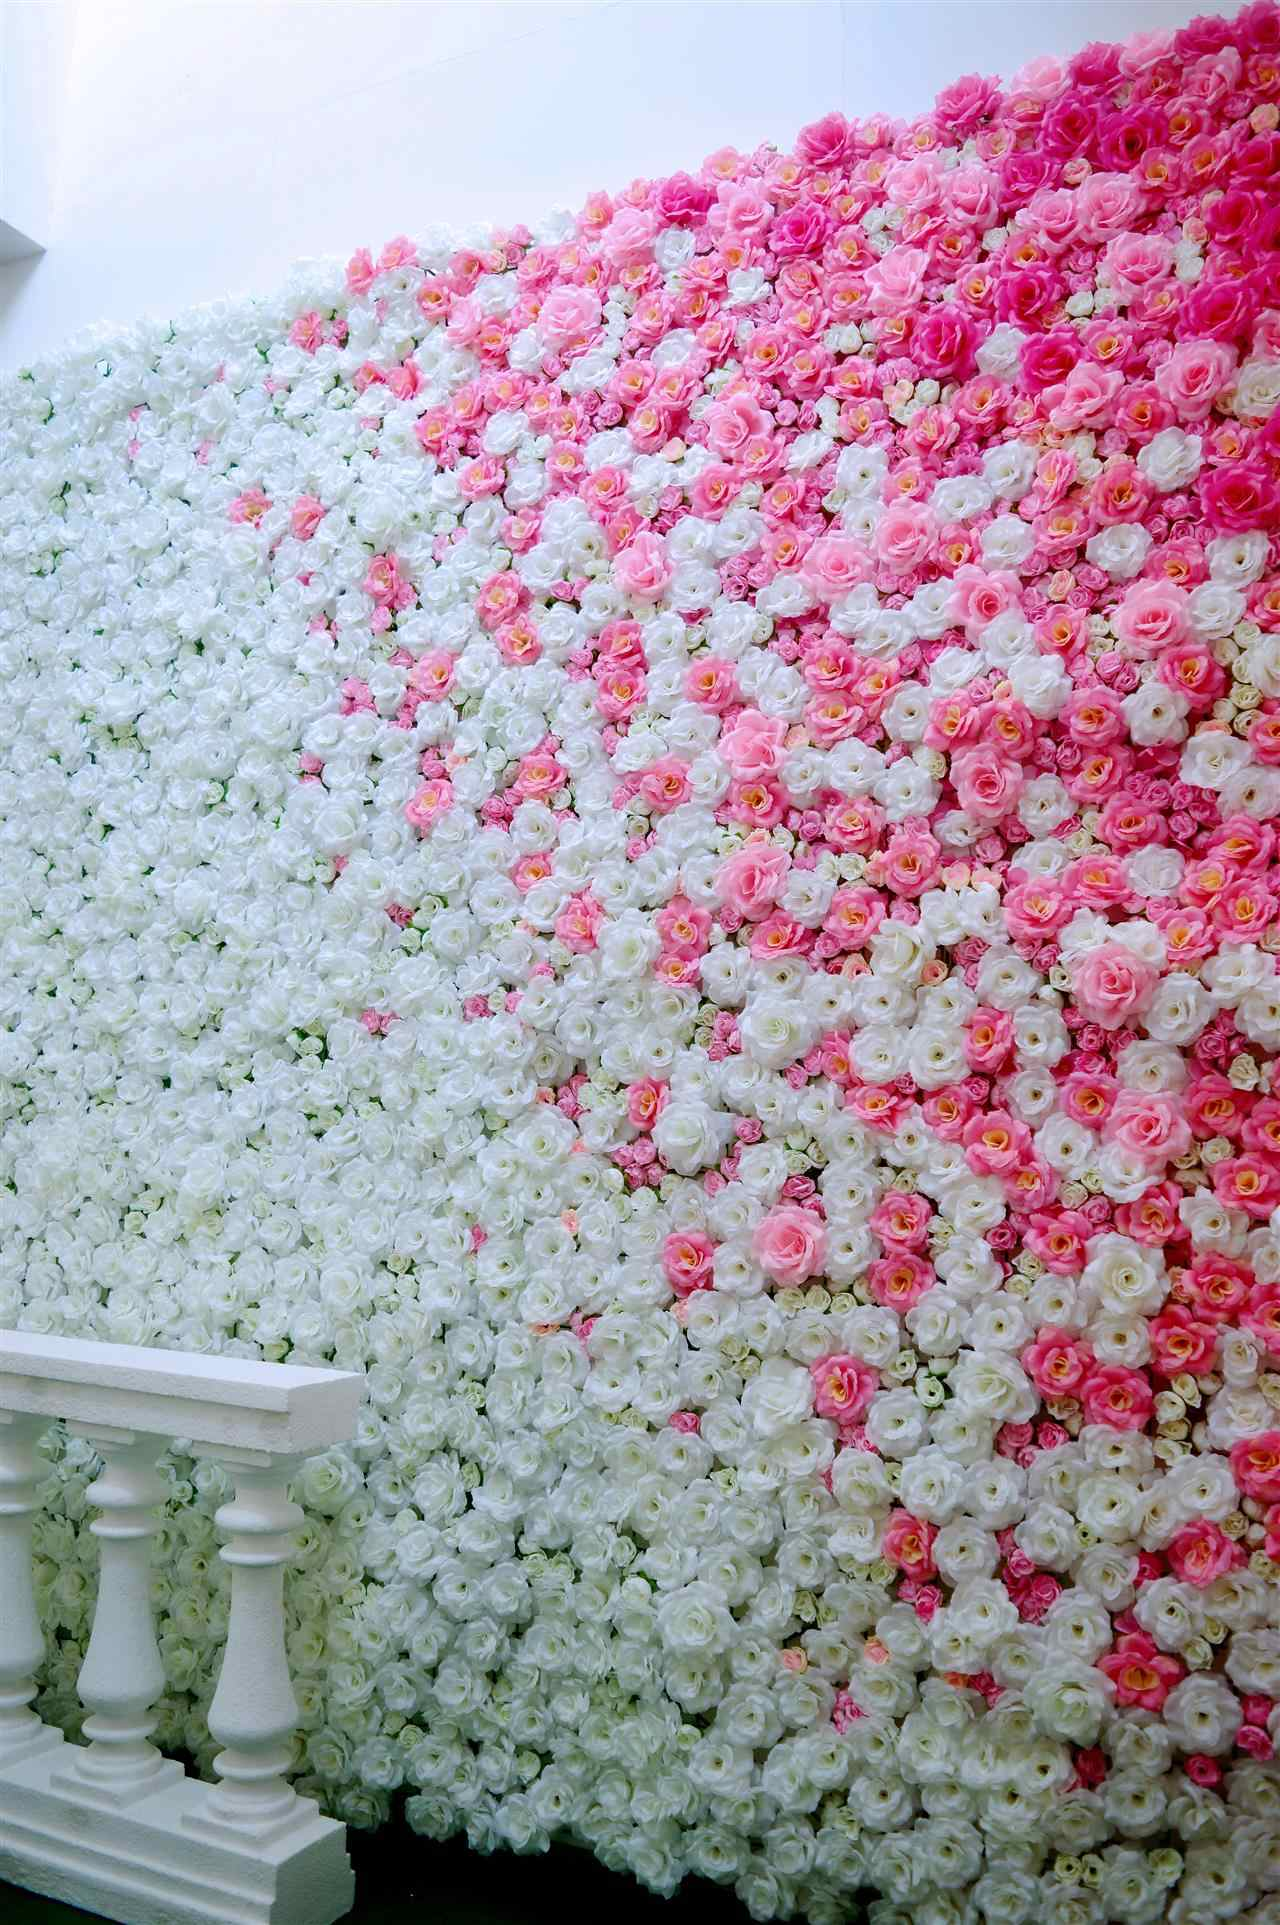 Hot 1 pcs/lot diameter 8 CM Sutra Buatan Naik Kepala Bunga untuk Pernikahan Pesta Natal Dekorasi DIY Scrapbooking Bunga Bola